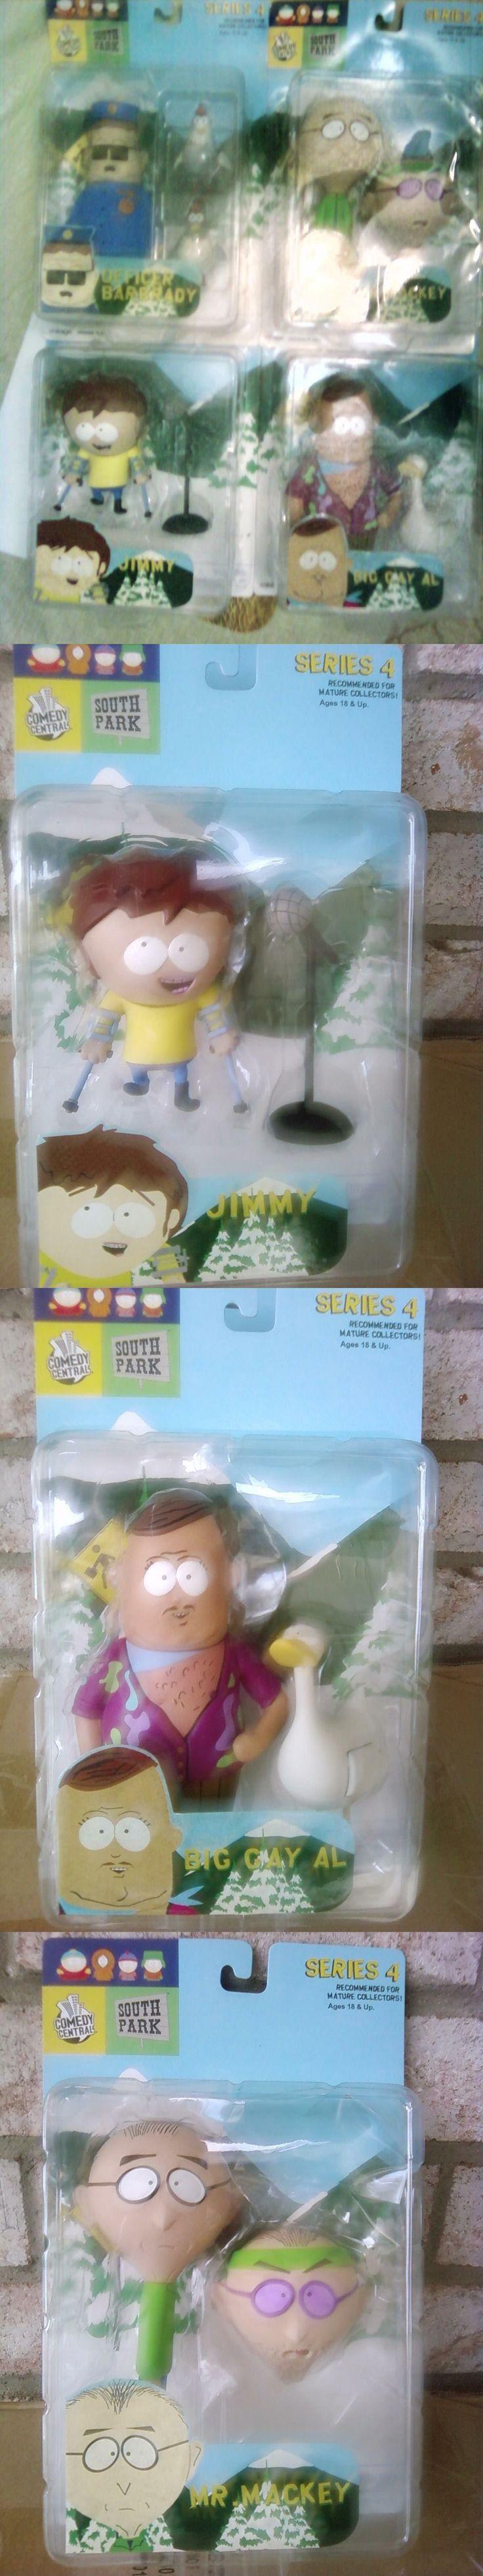 South Park 20918: South Park Series 4 Mr. Mackey,Big Gay Al, Officer Barbrady, Jimmy Set 4 Figure -> BUY IT NOW ONLY: $74.95 on eBay!